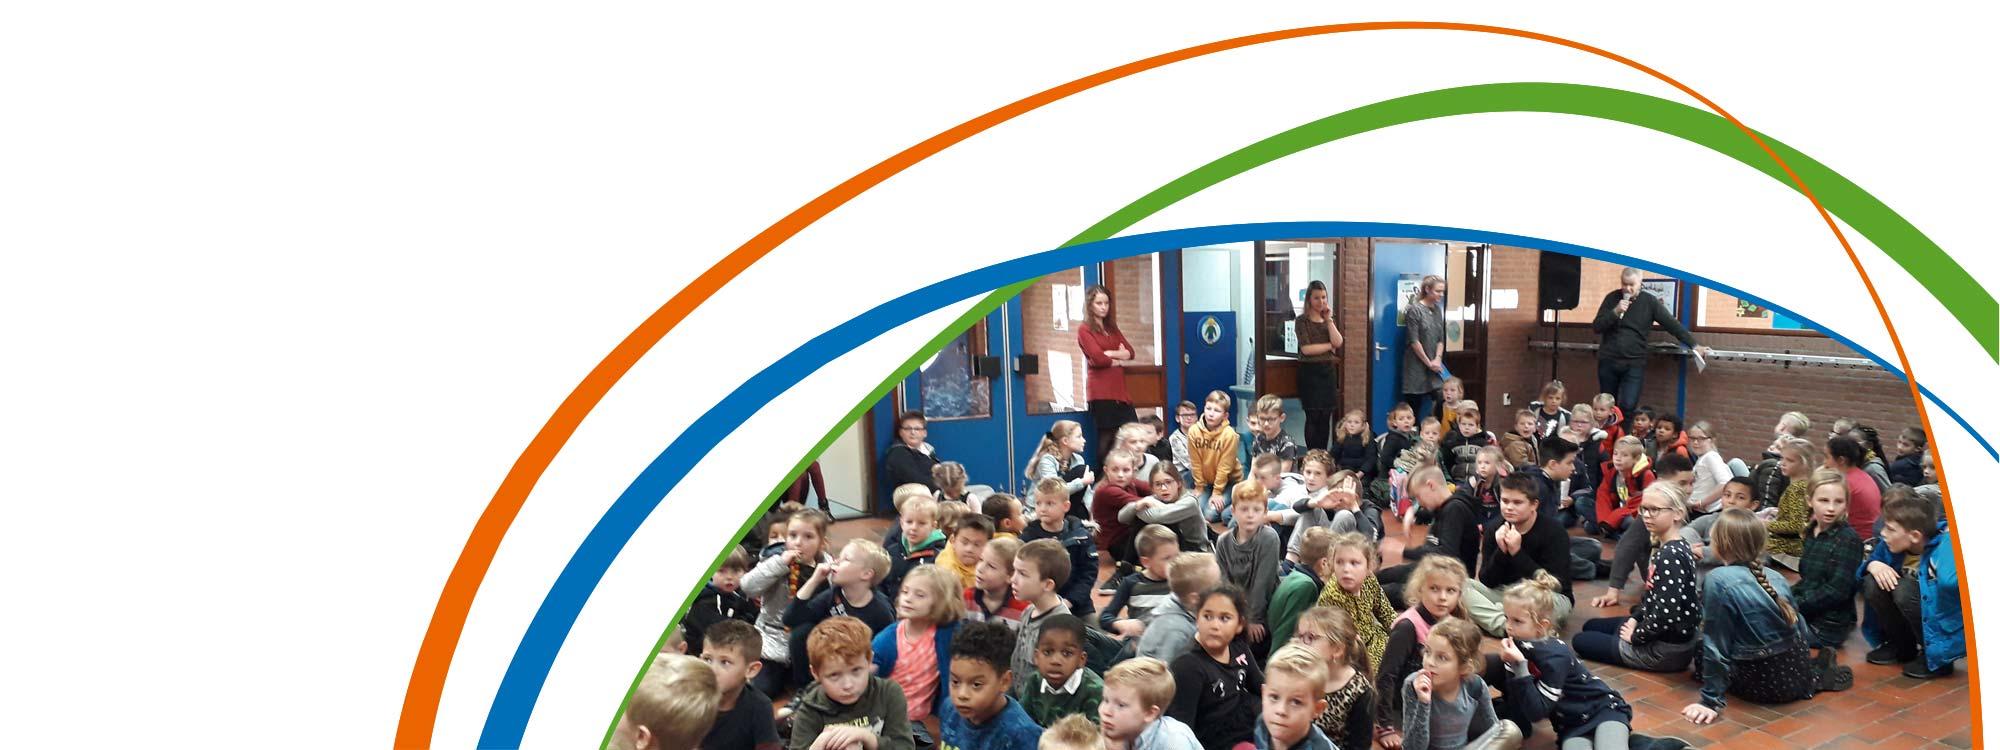 Timotheüs reformatorische basisschool Lelystad